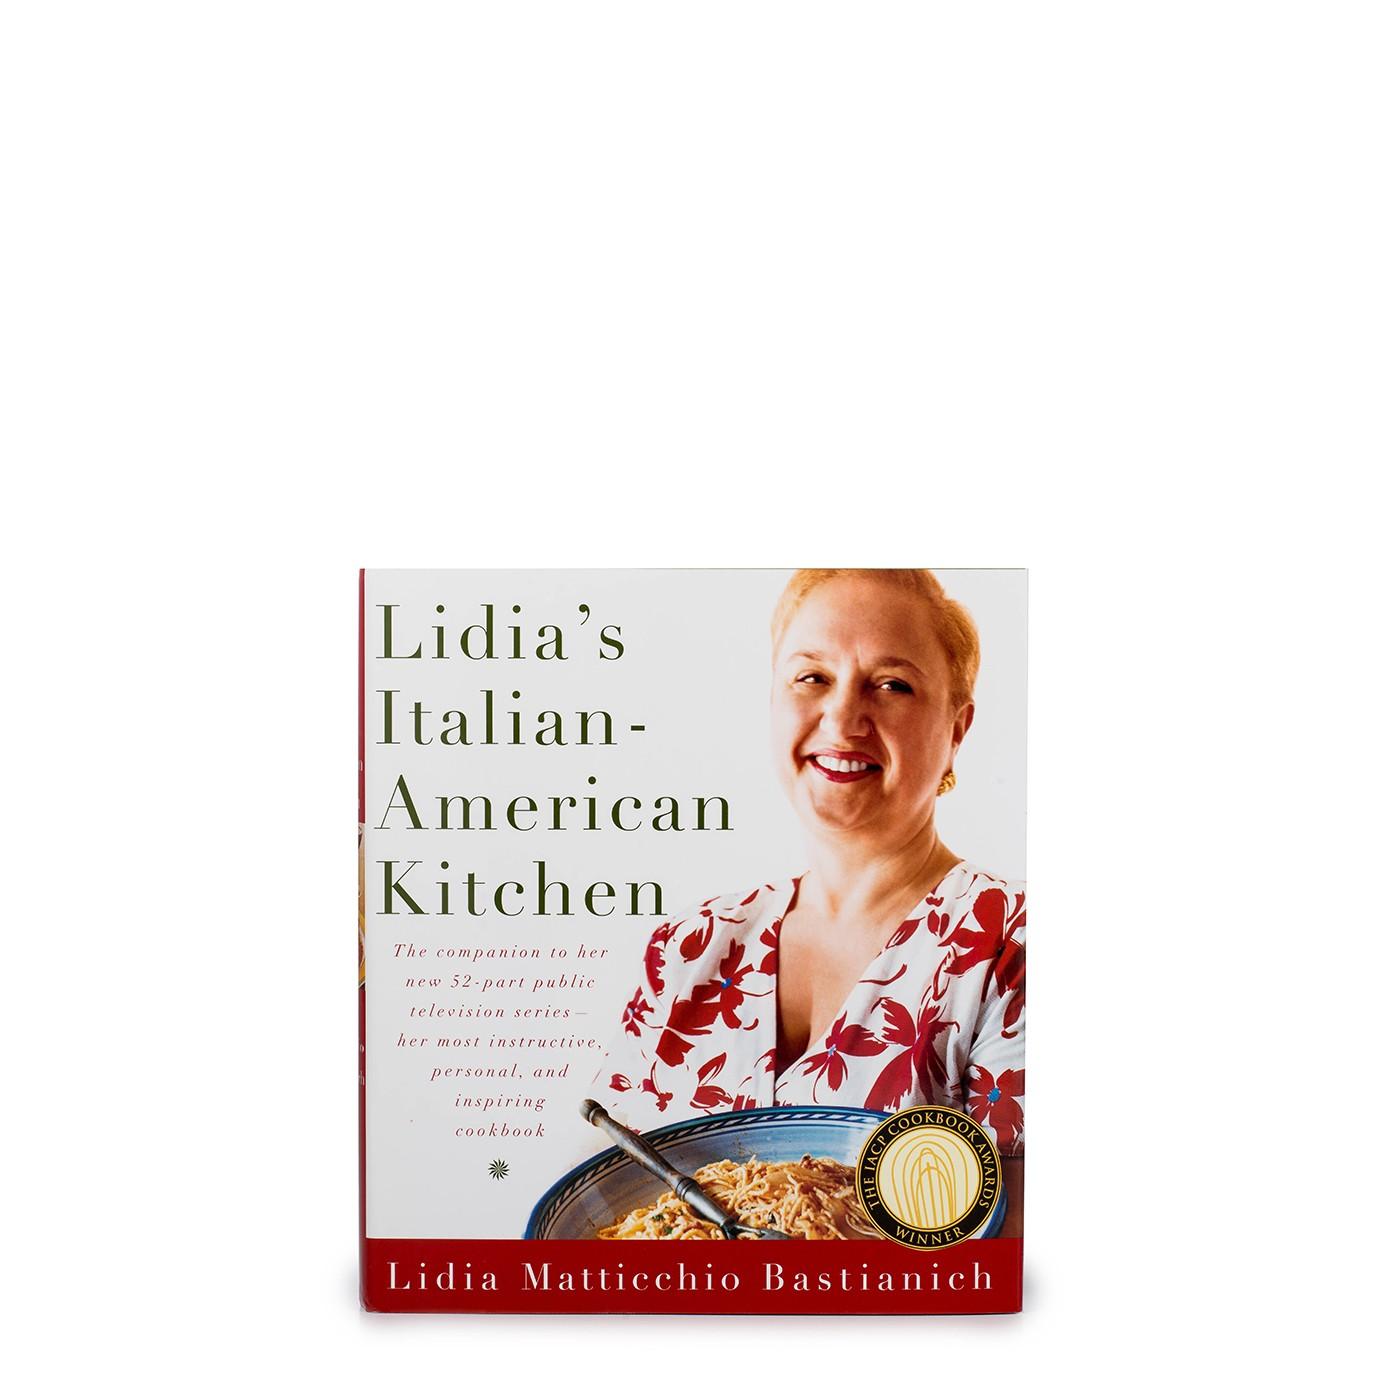 Lidia's Italian-American Kitchen (hardcover)